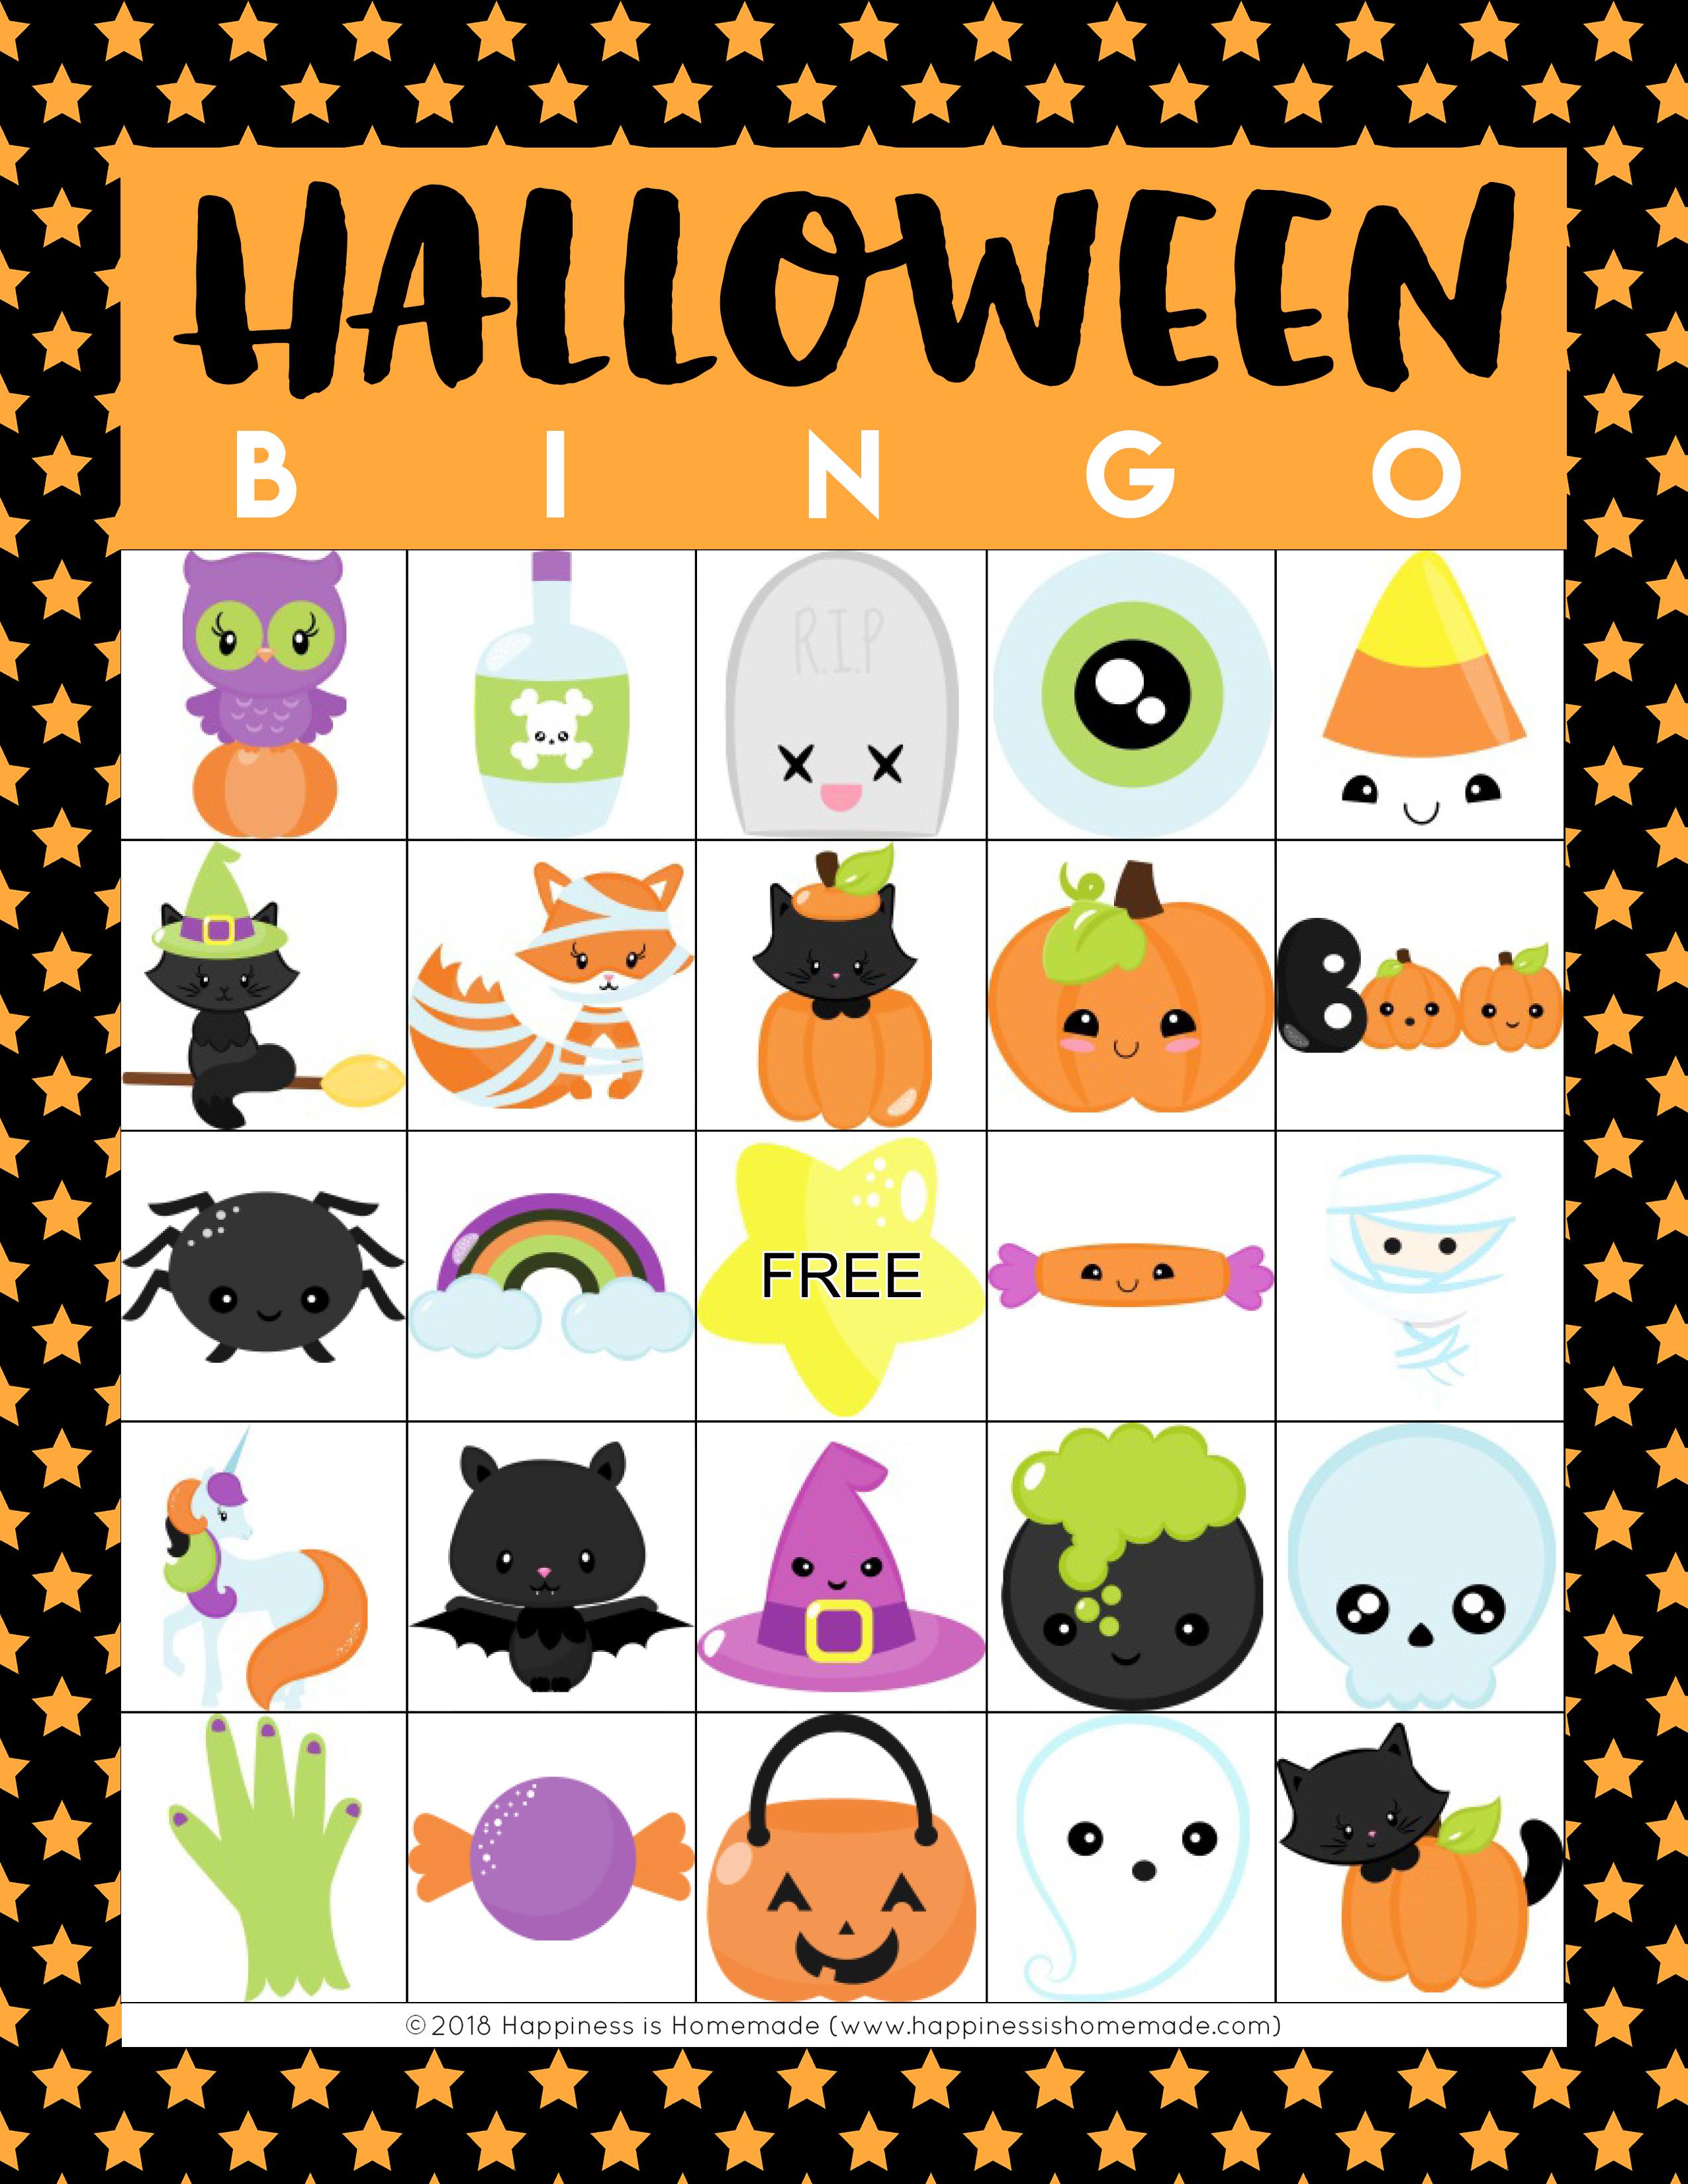 Printable Halloween Bingo Cards - Happiness Is Homemade - Free Printable Halloween Bingo